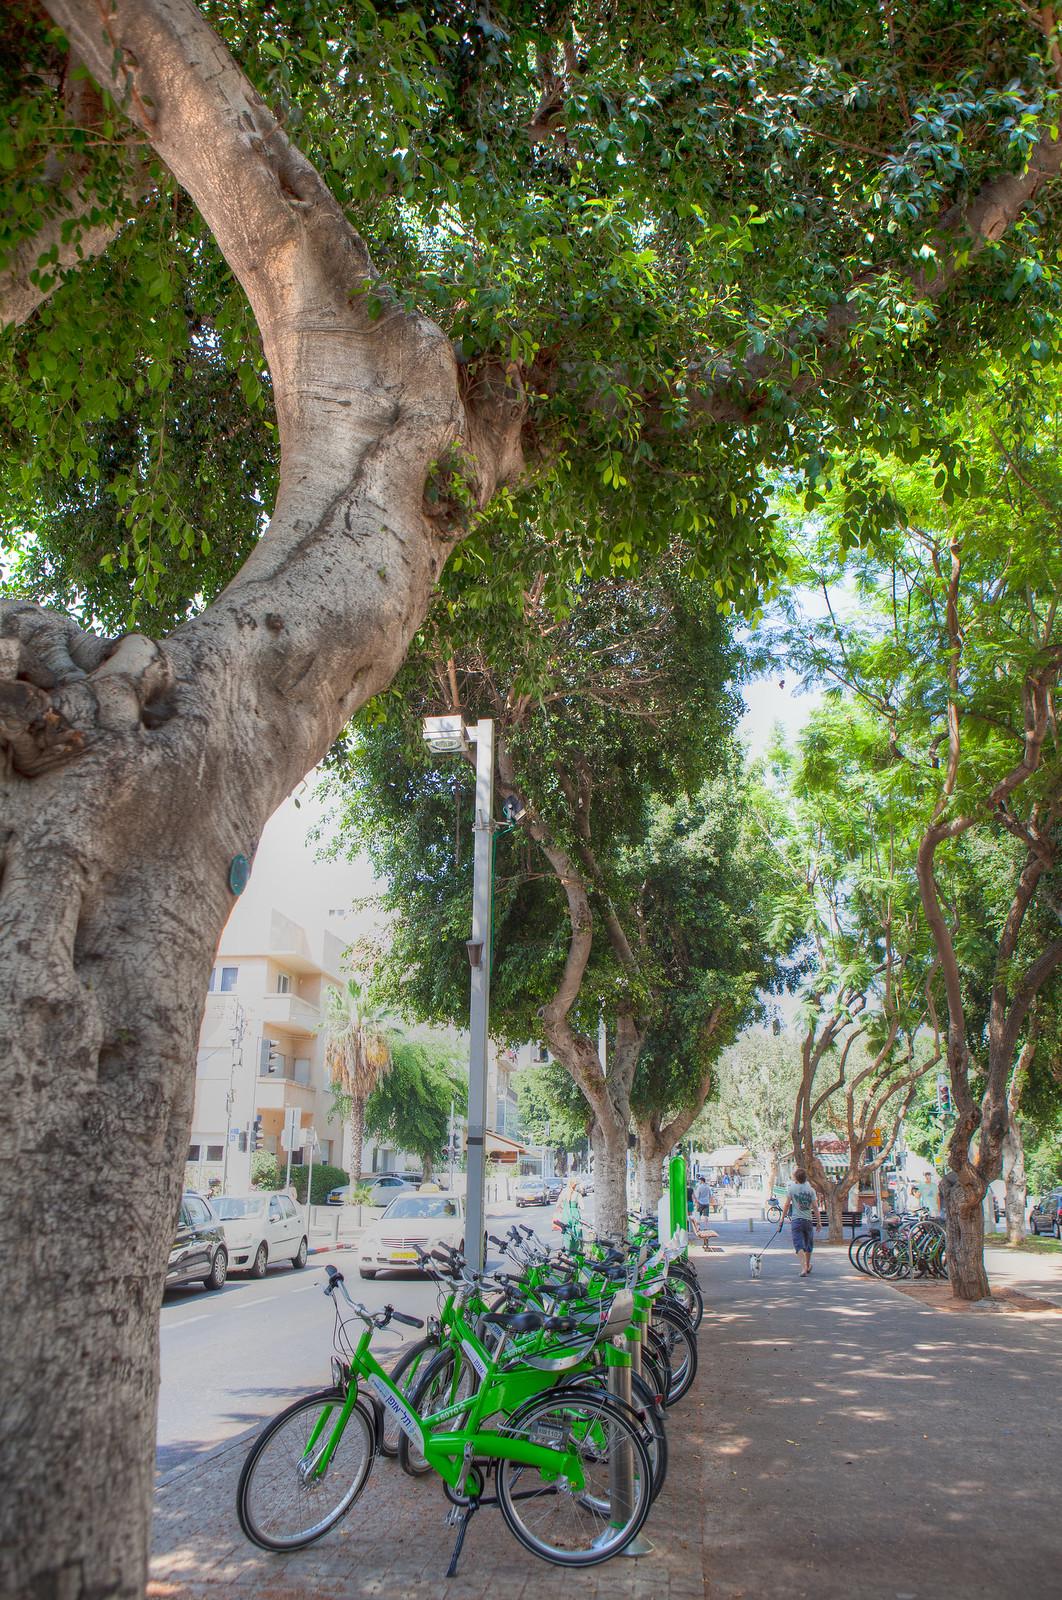 IMG_6958_59_60_Rotschild Blvd_Tel Aviv_Dana Friedlander_IMOT